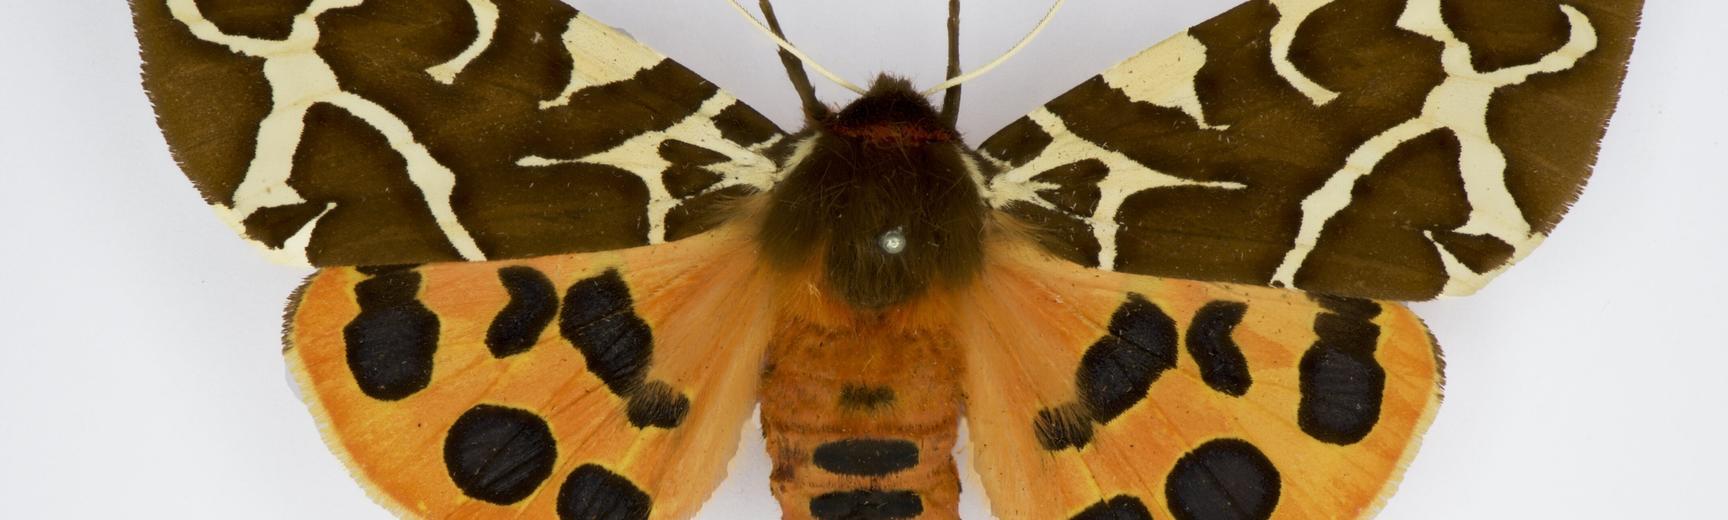 arctia caja dorsal moth